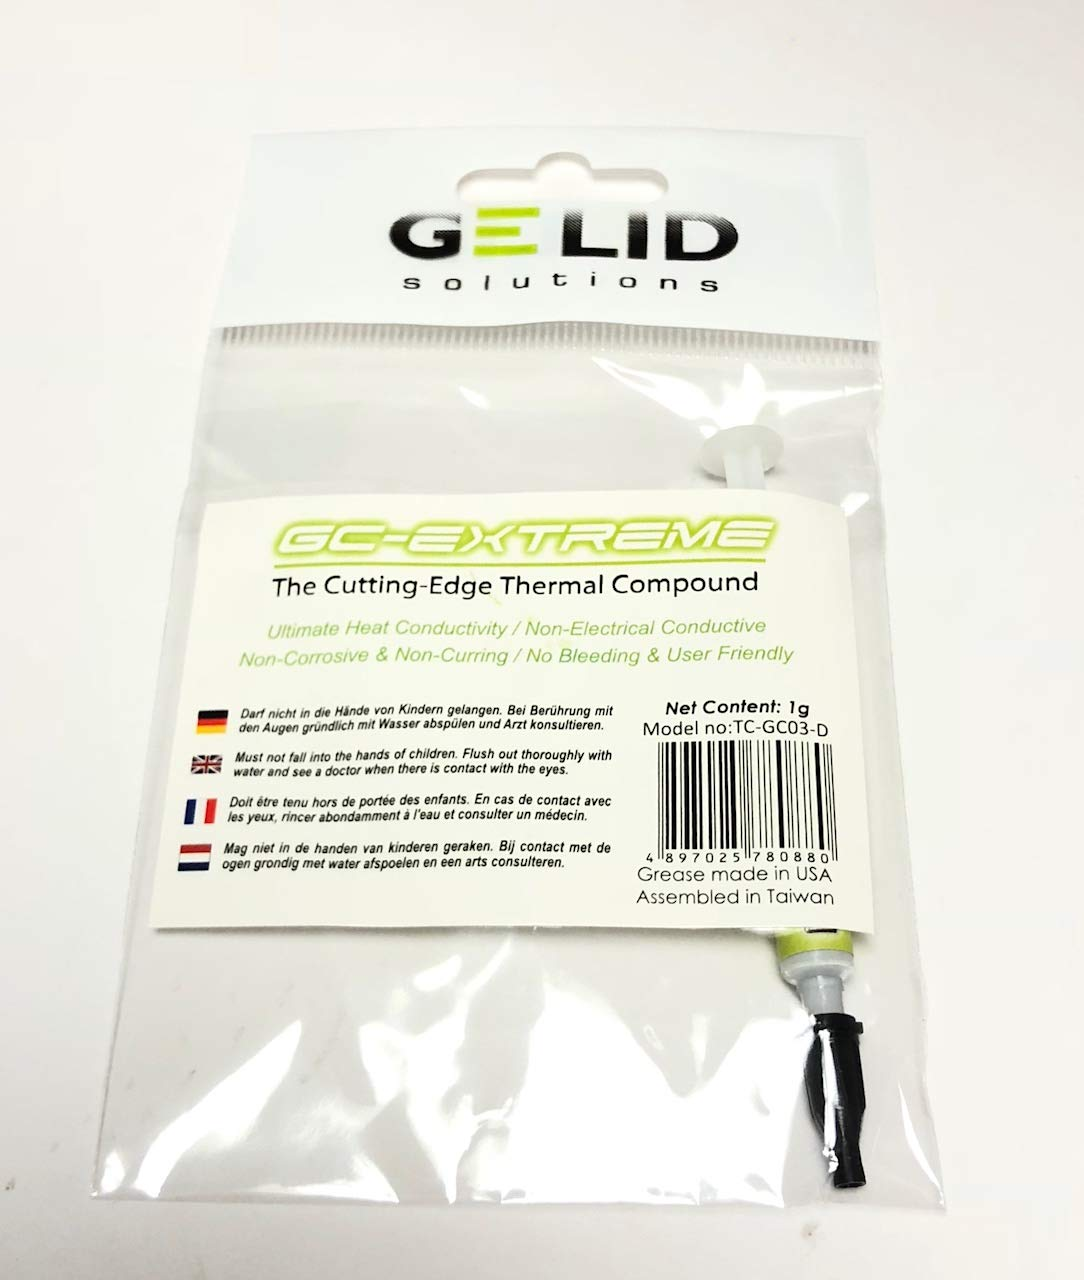 GELID GC-Extreme 3.5g con herramientas - Pasta conductora térmica ...